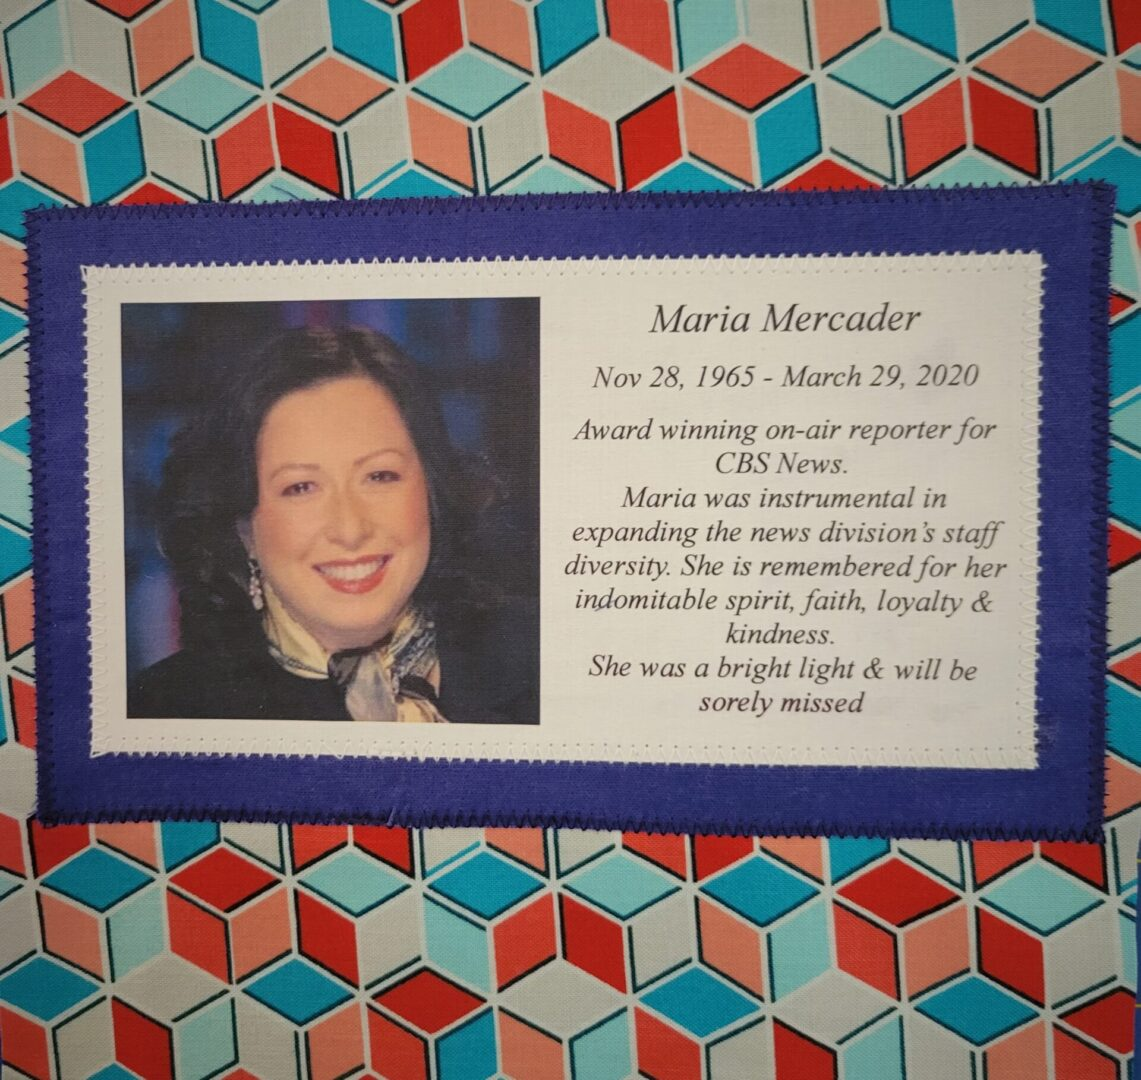 IN MEMORY OF MARIA MERCADER - NOVEMBER 28, 1965 - MARCH 29, 2020.